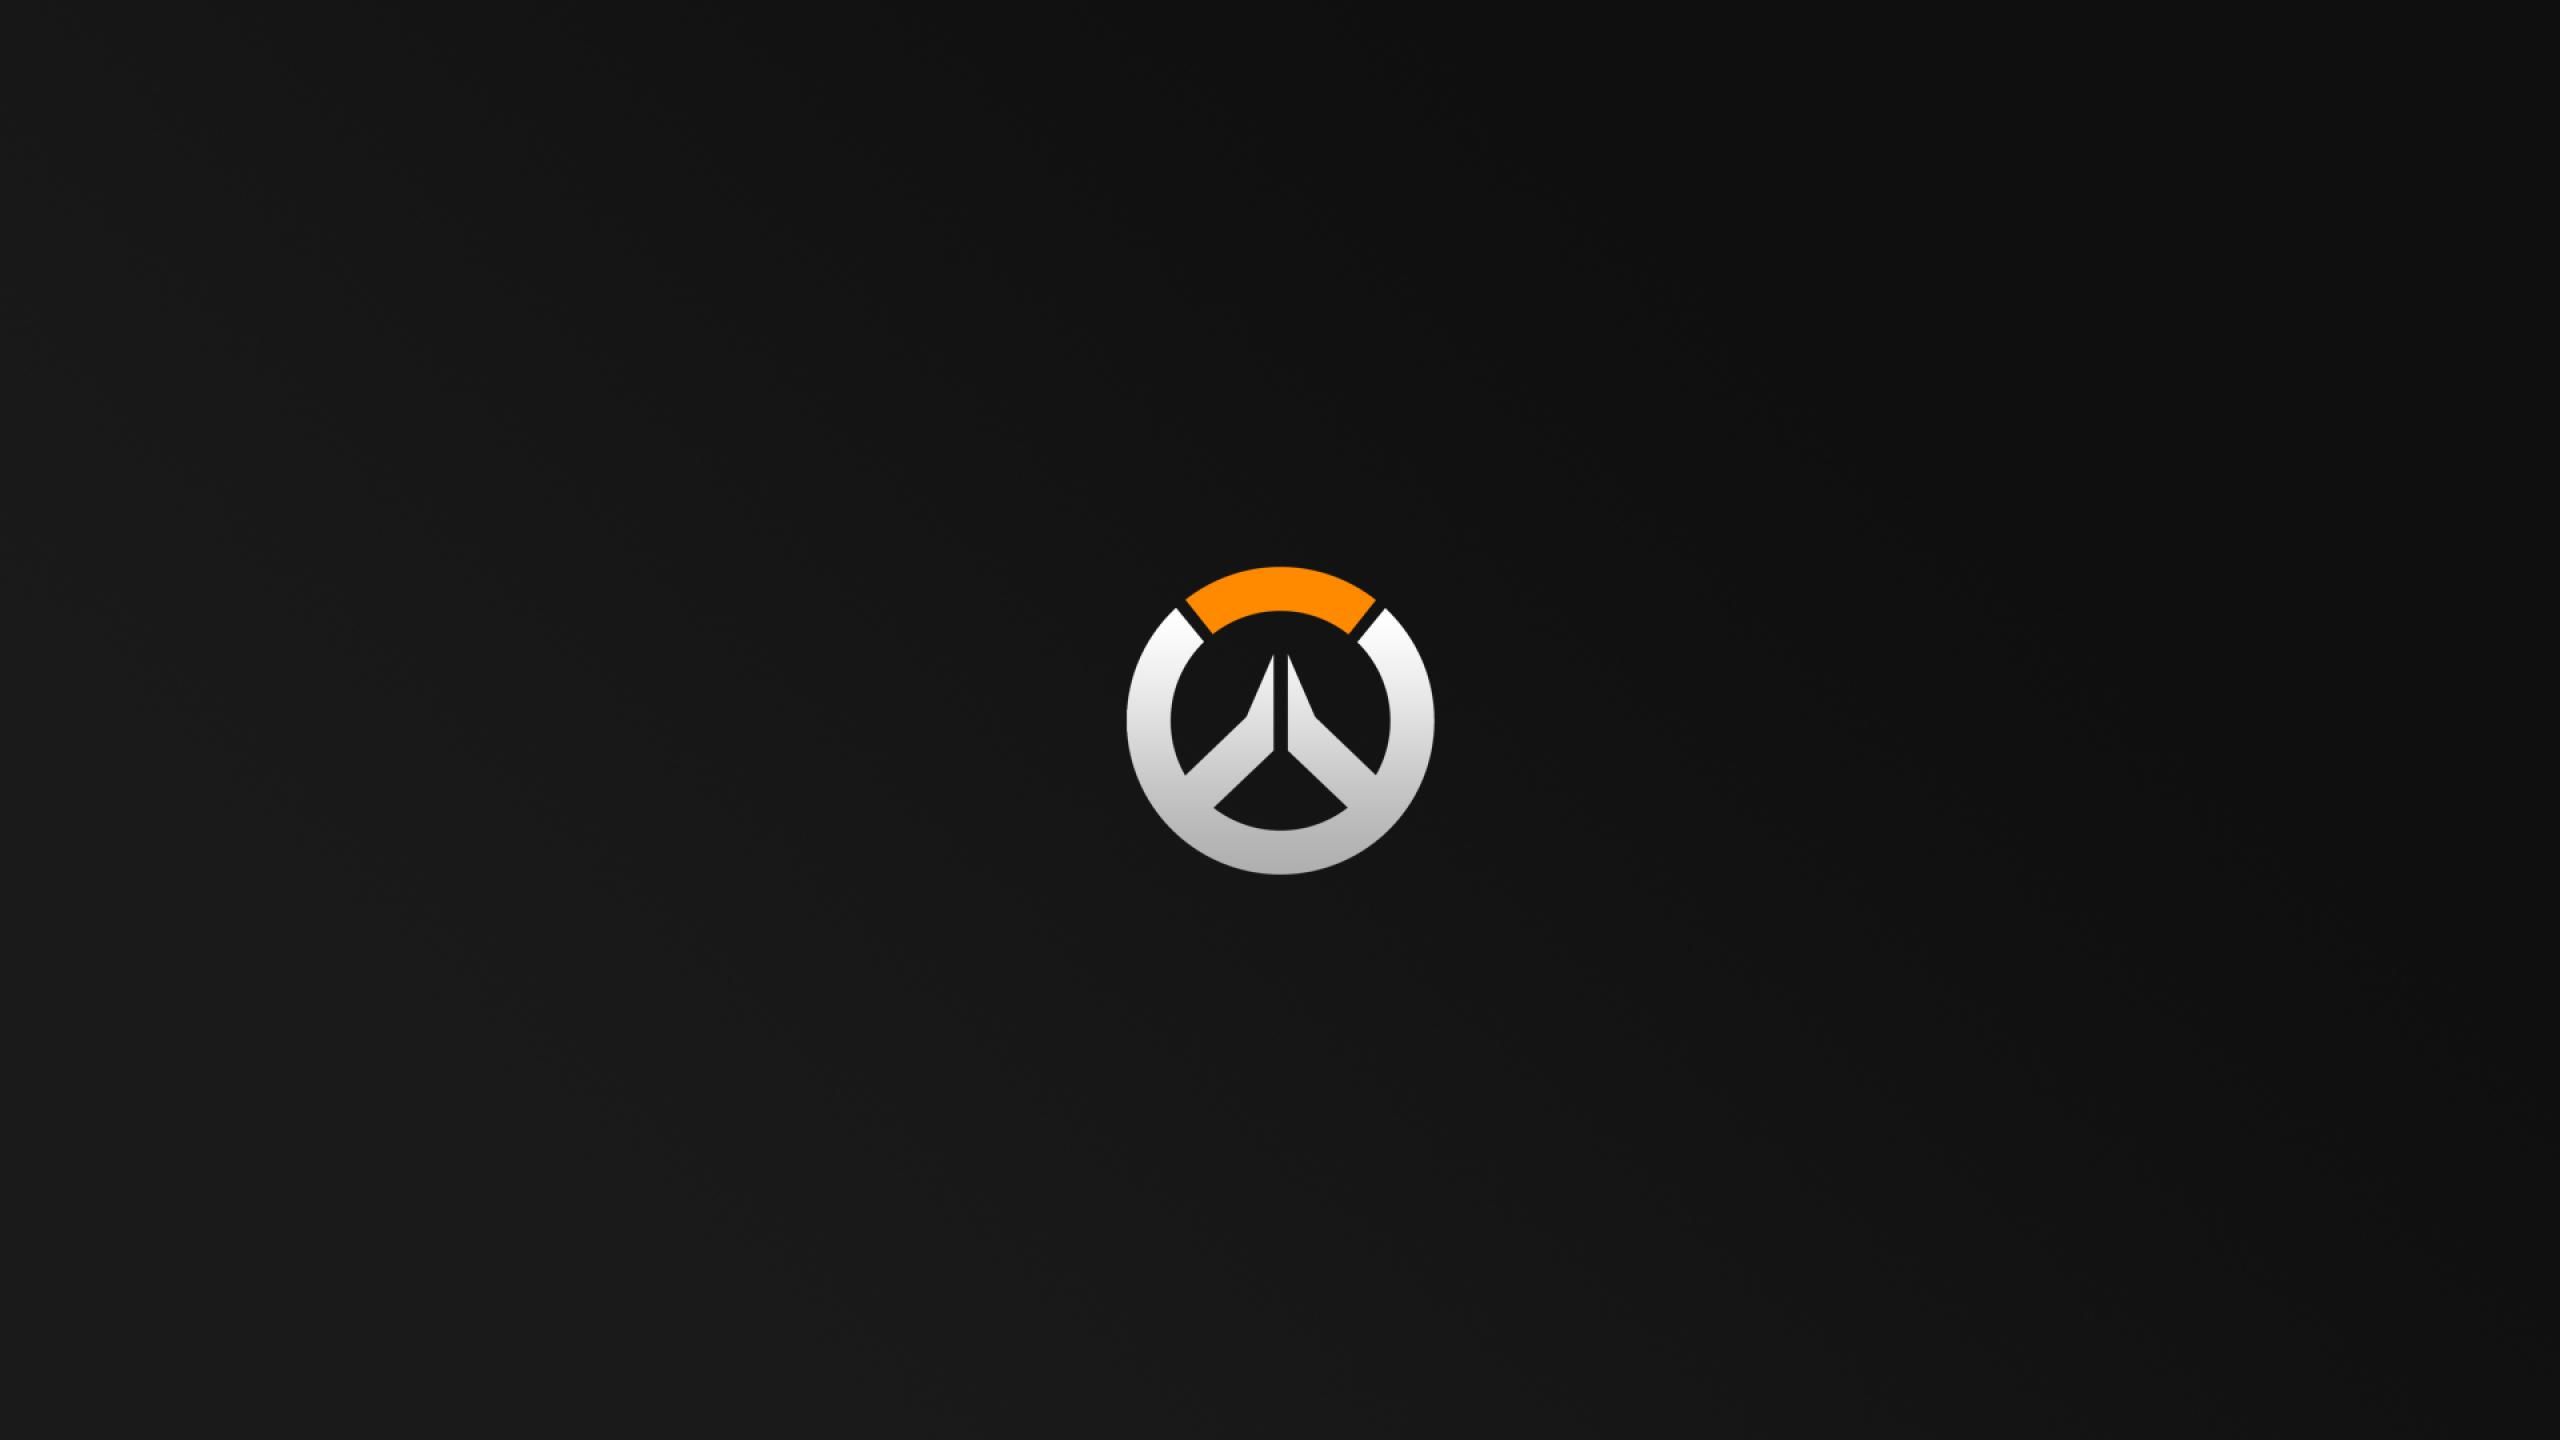 2560x1440 Overwatch Logo 1440P Resolution Wallpaper, HD.